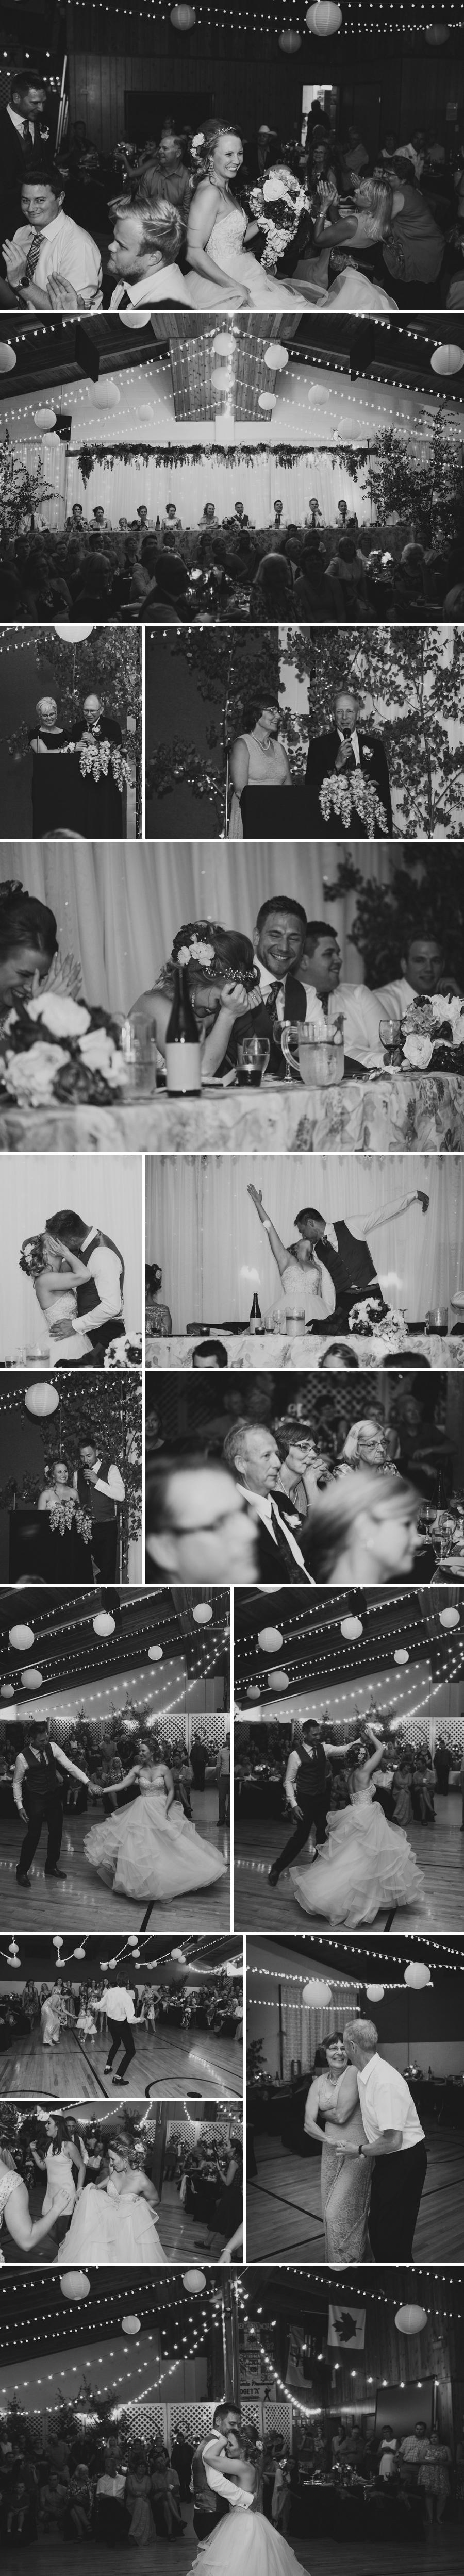 bbcollective_yeg_blog_2017_jessicaandthomas_wedding_photographycomp003.jpg